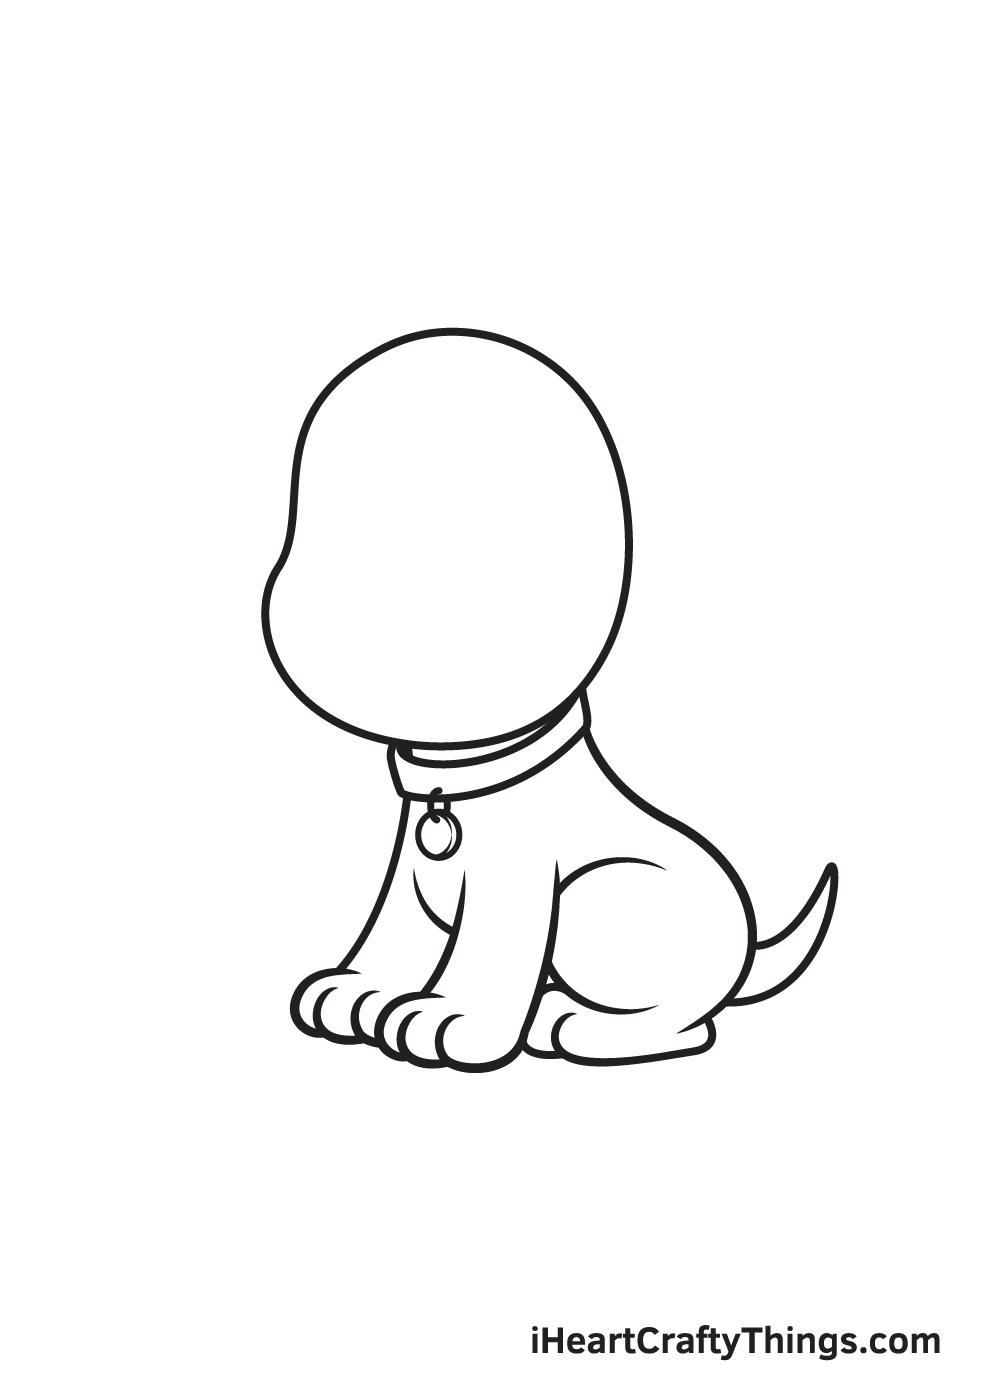 dog drawing - step 6